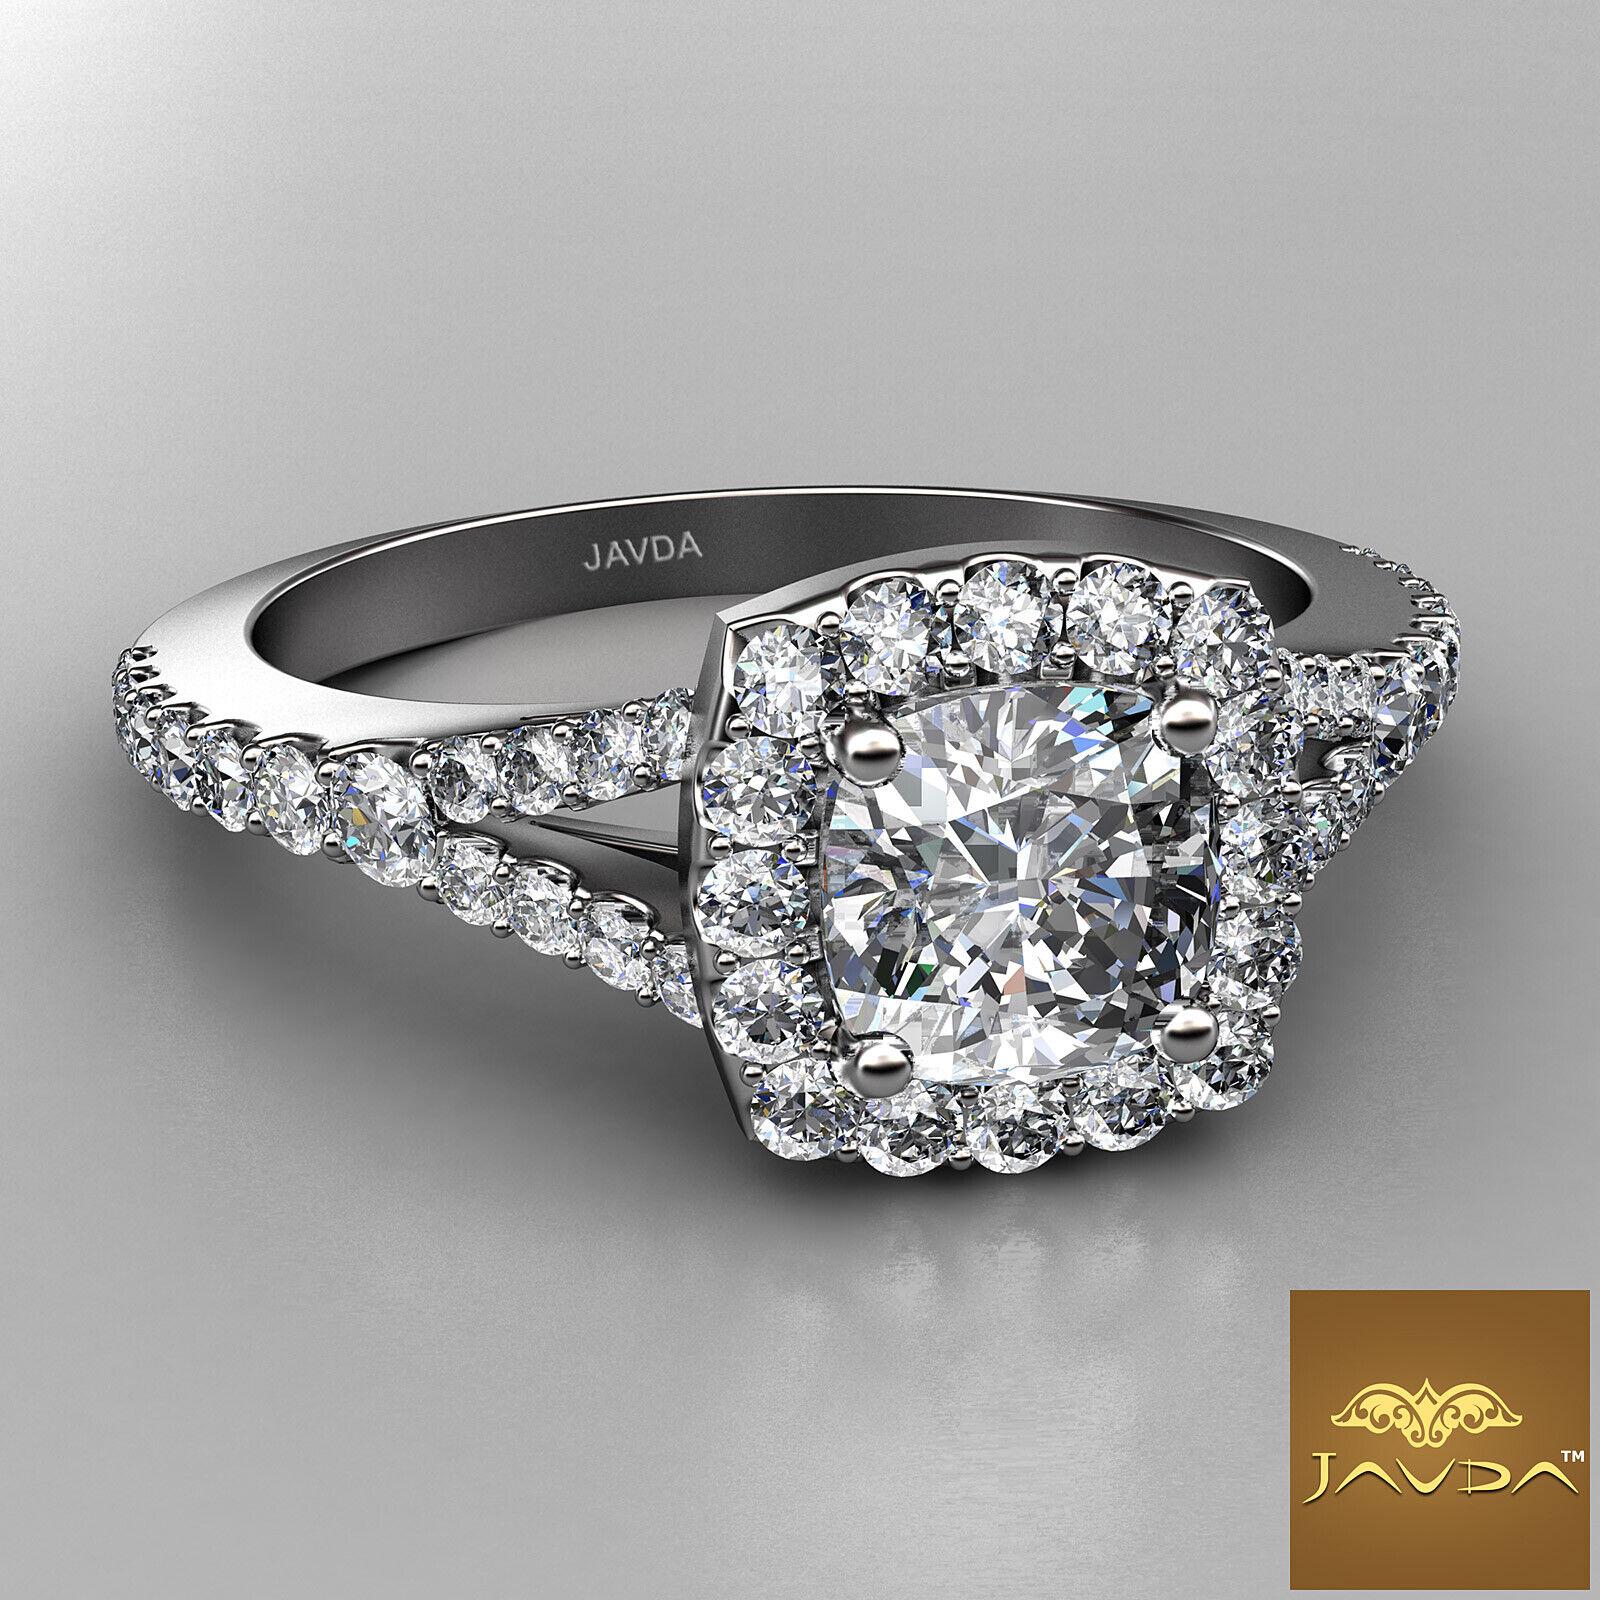 Cushion Shape Diamond Engagement GIA G VVS2 Halo Pre-Set Ring 18k White Gold 1Ct 1